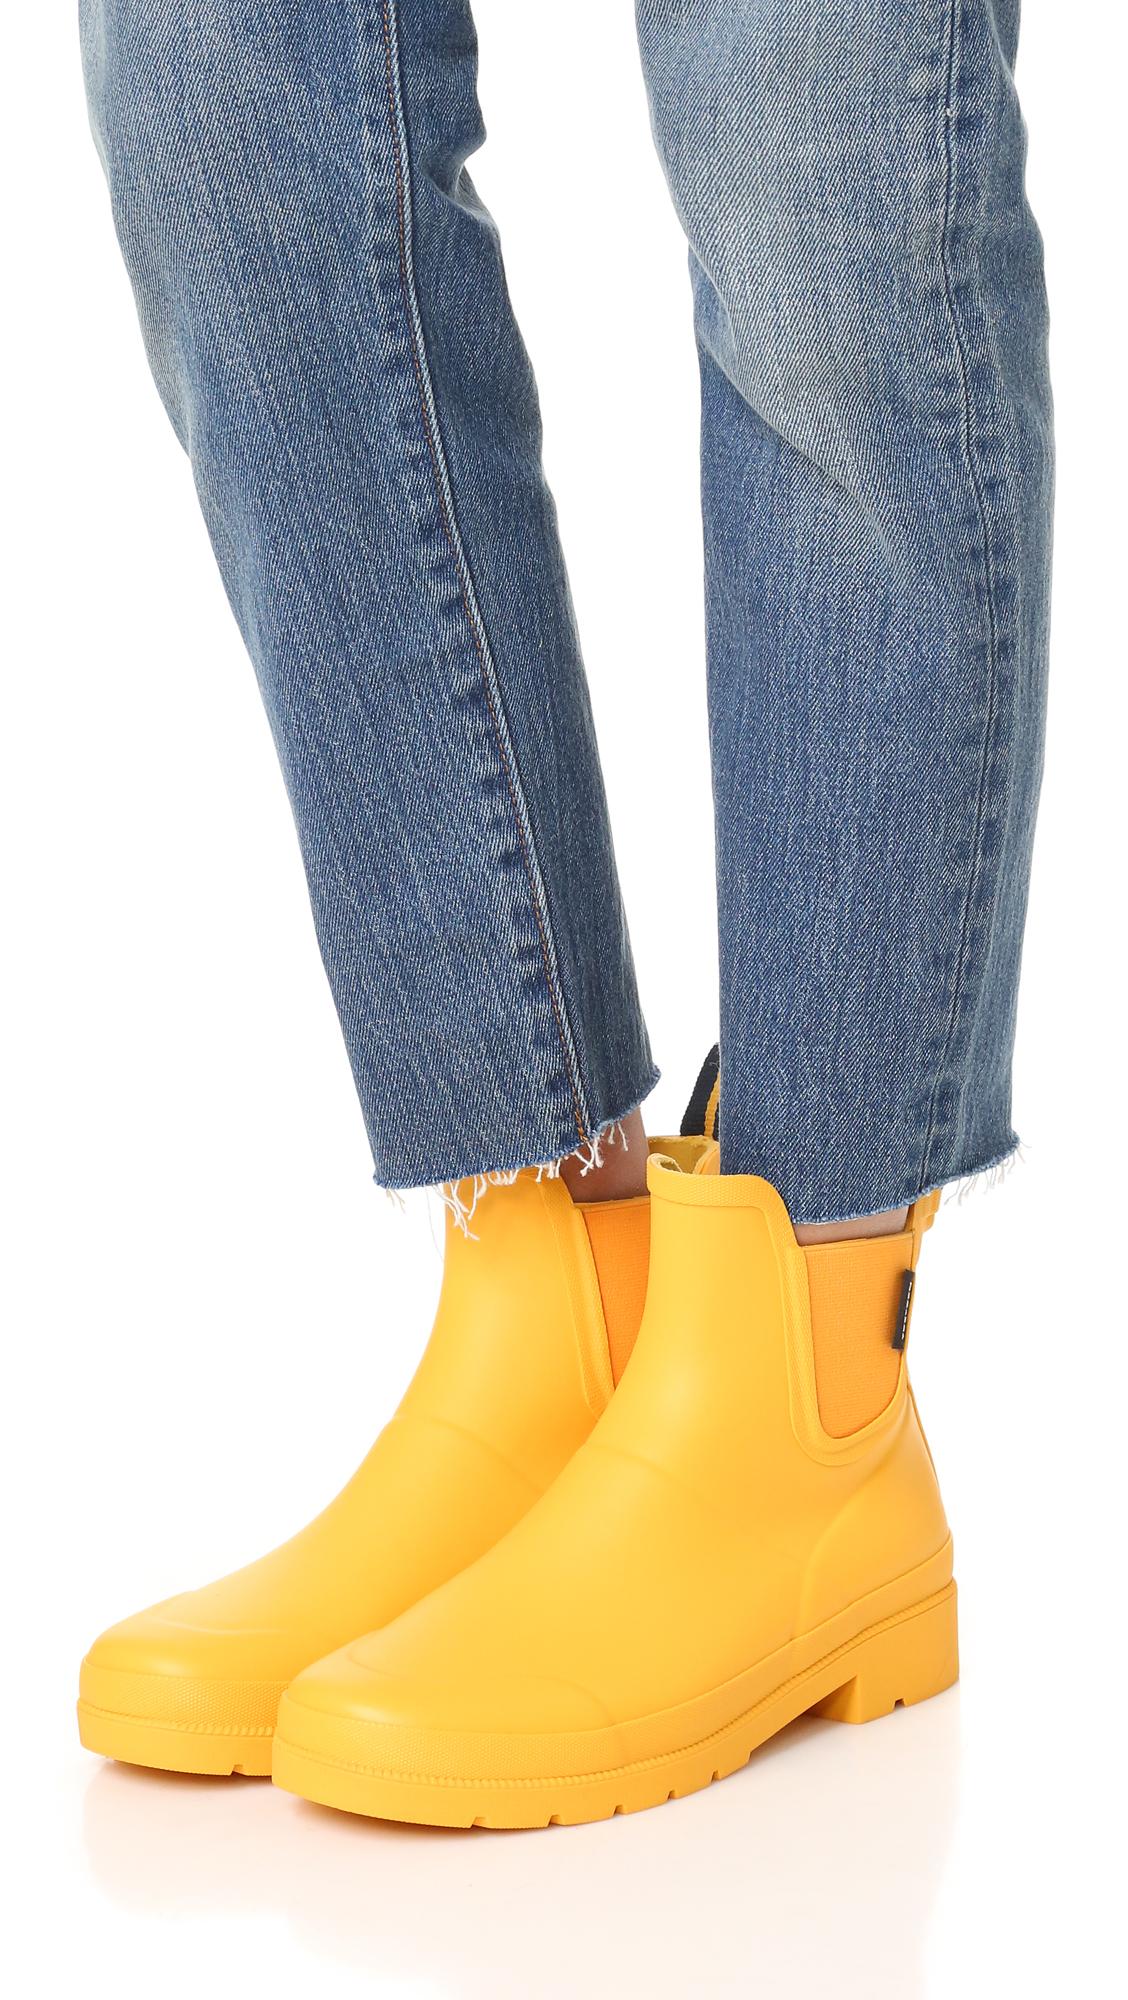 Tretorn Rubber Lina Short Rain Booties